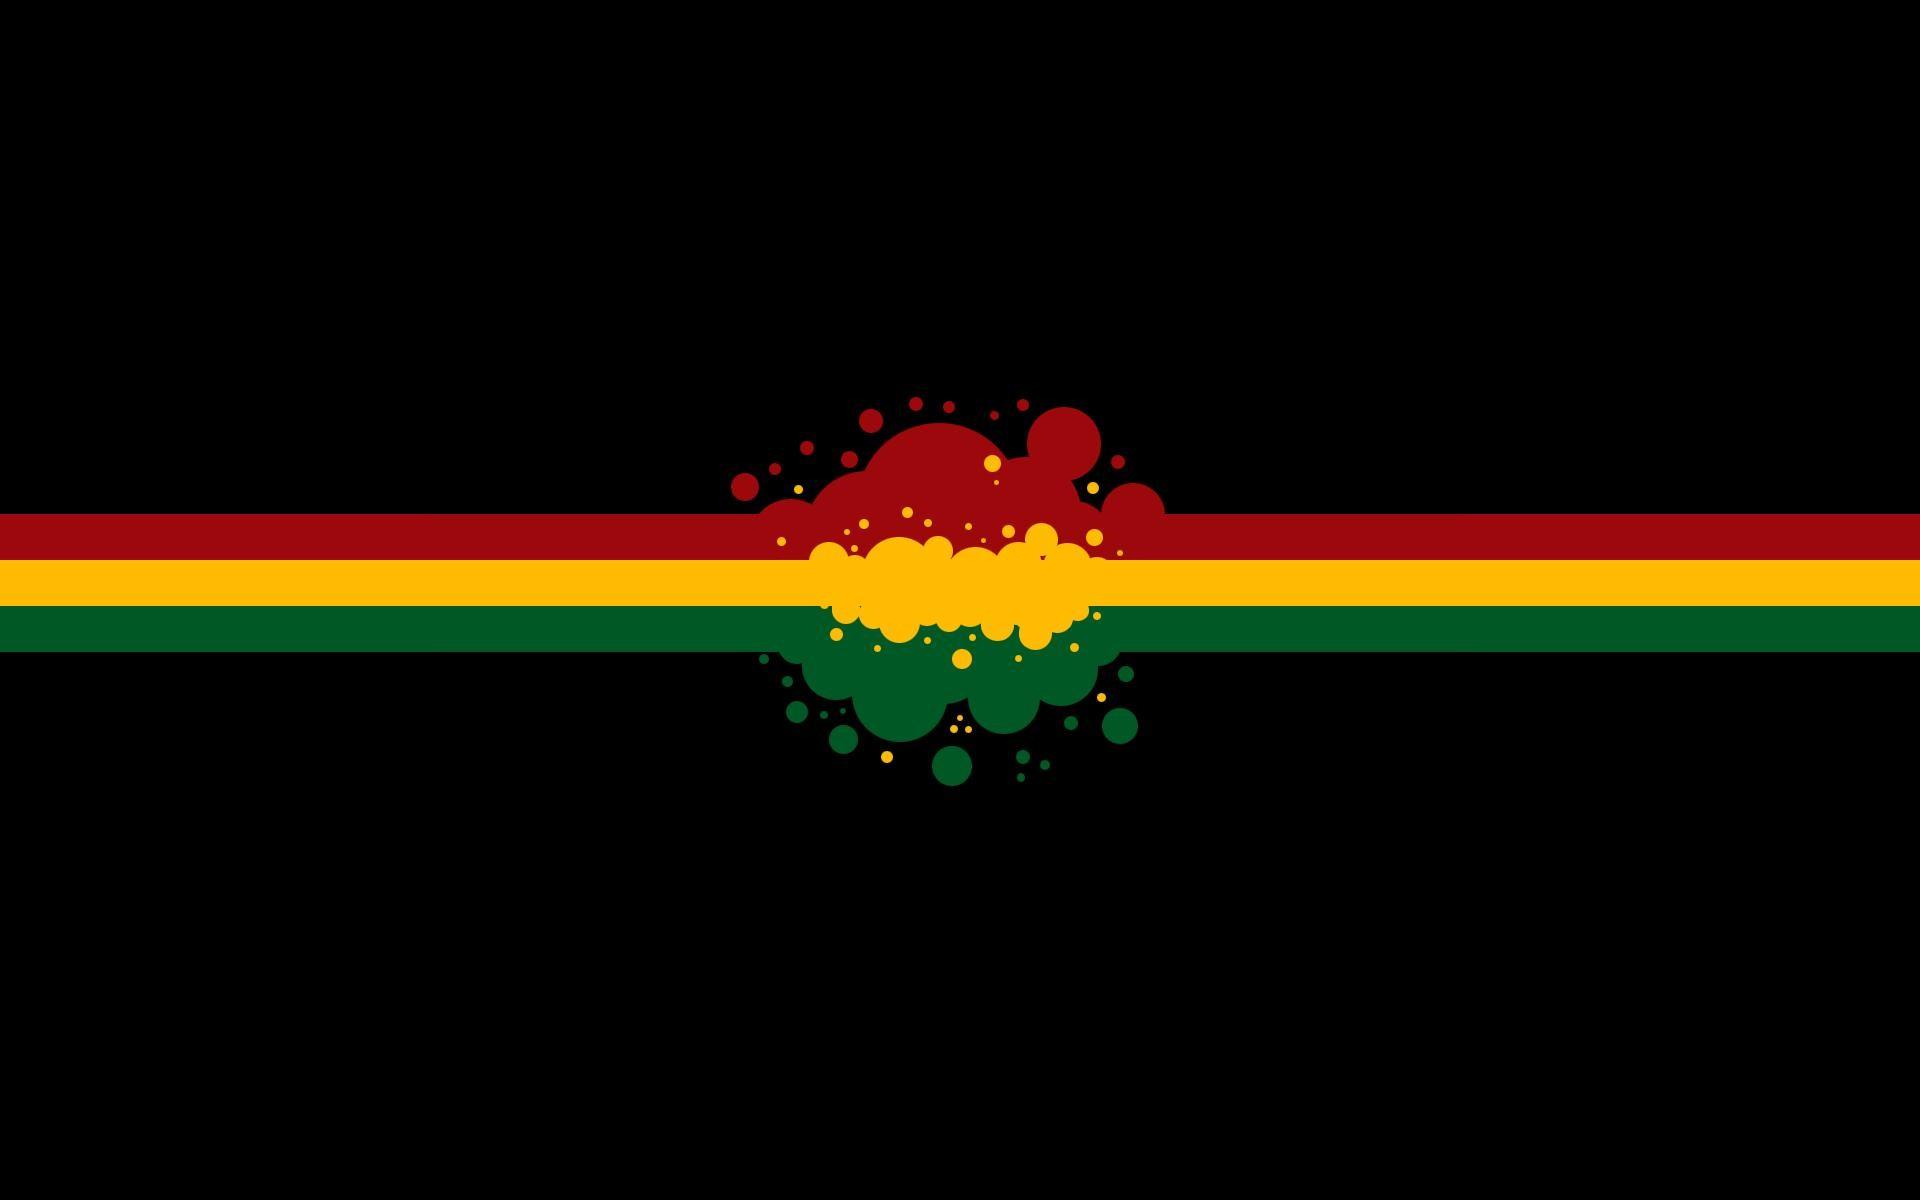 2560x1440 Wallpaper Cars Reggae Backgrounds 51 Images